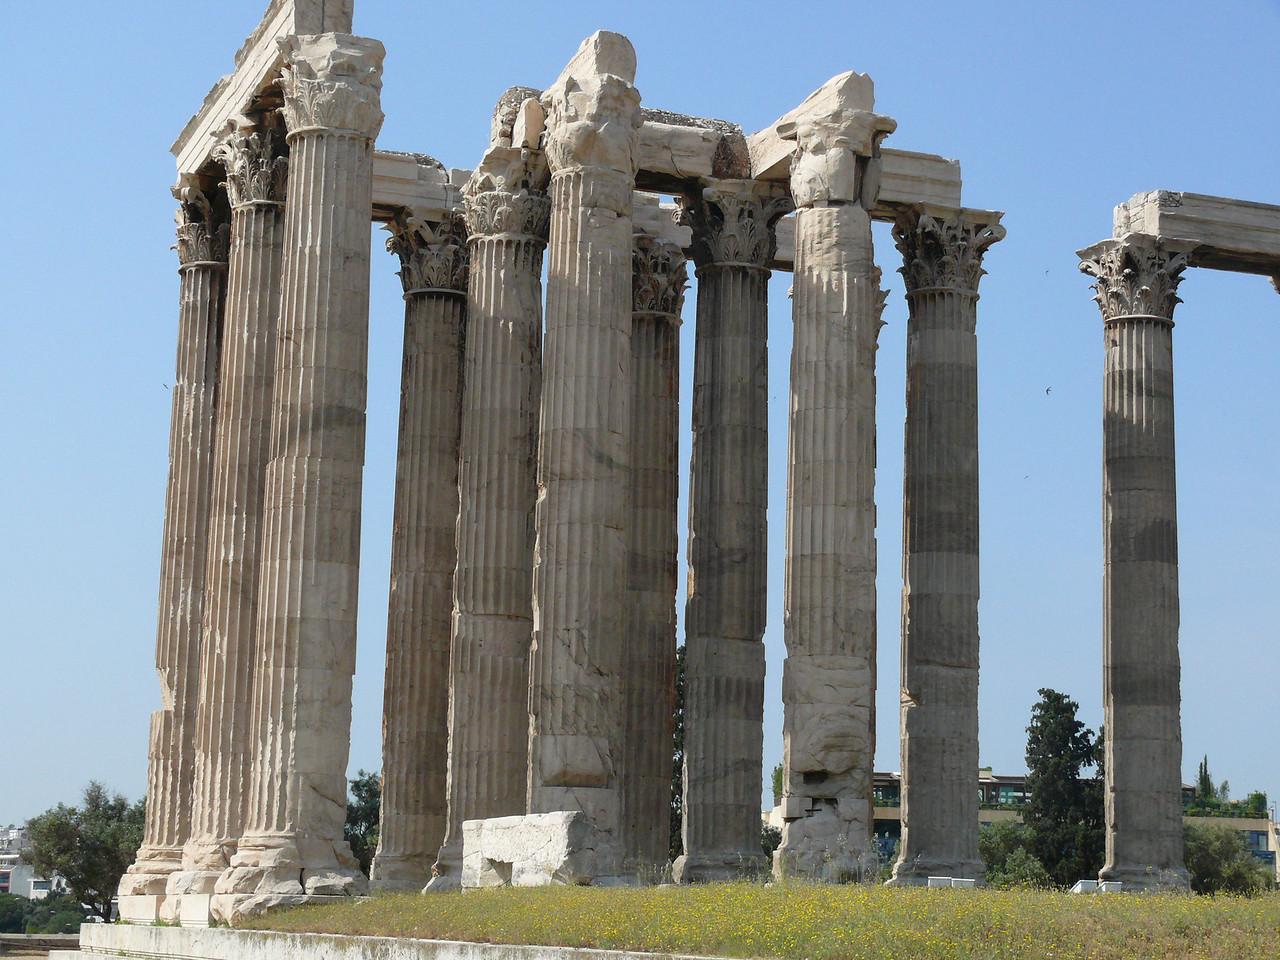 102_789 Greece Temple of Olympian Zeus